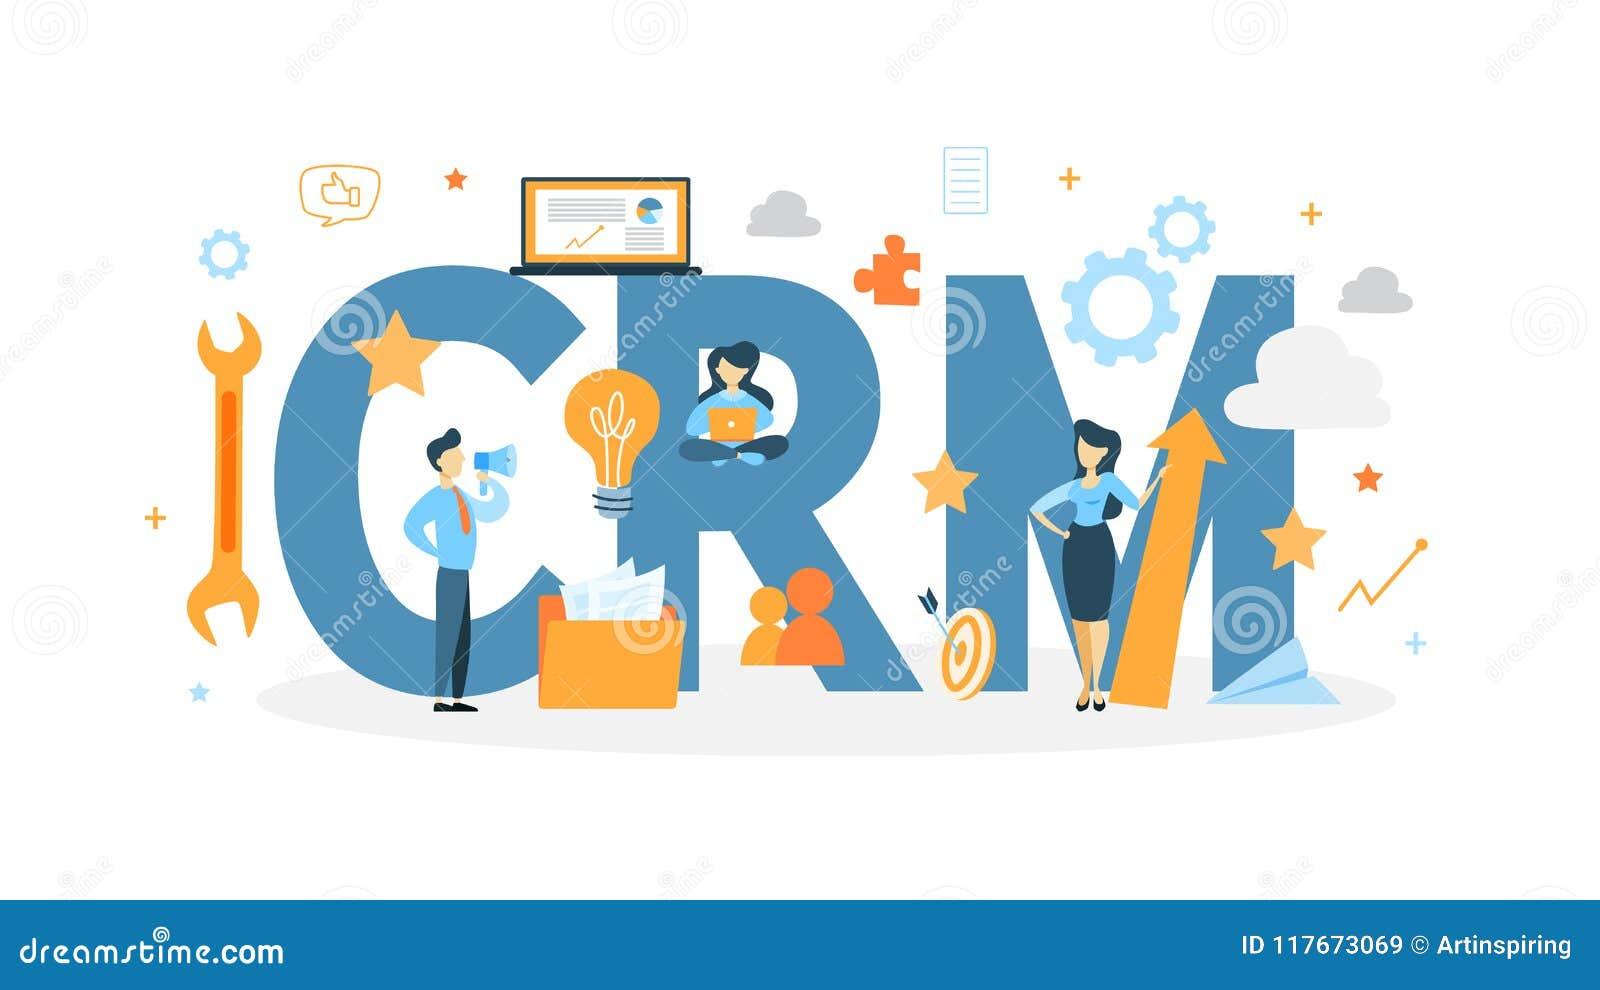 Crm-Konzept-Illustration